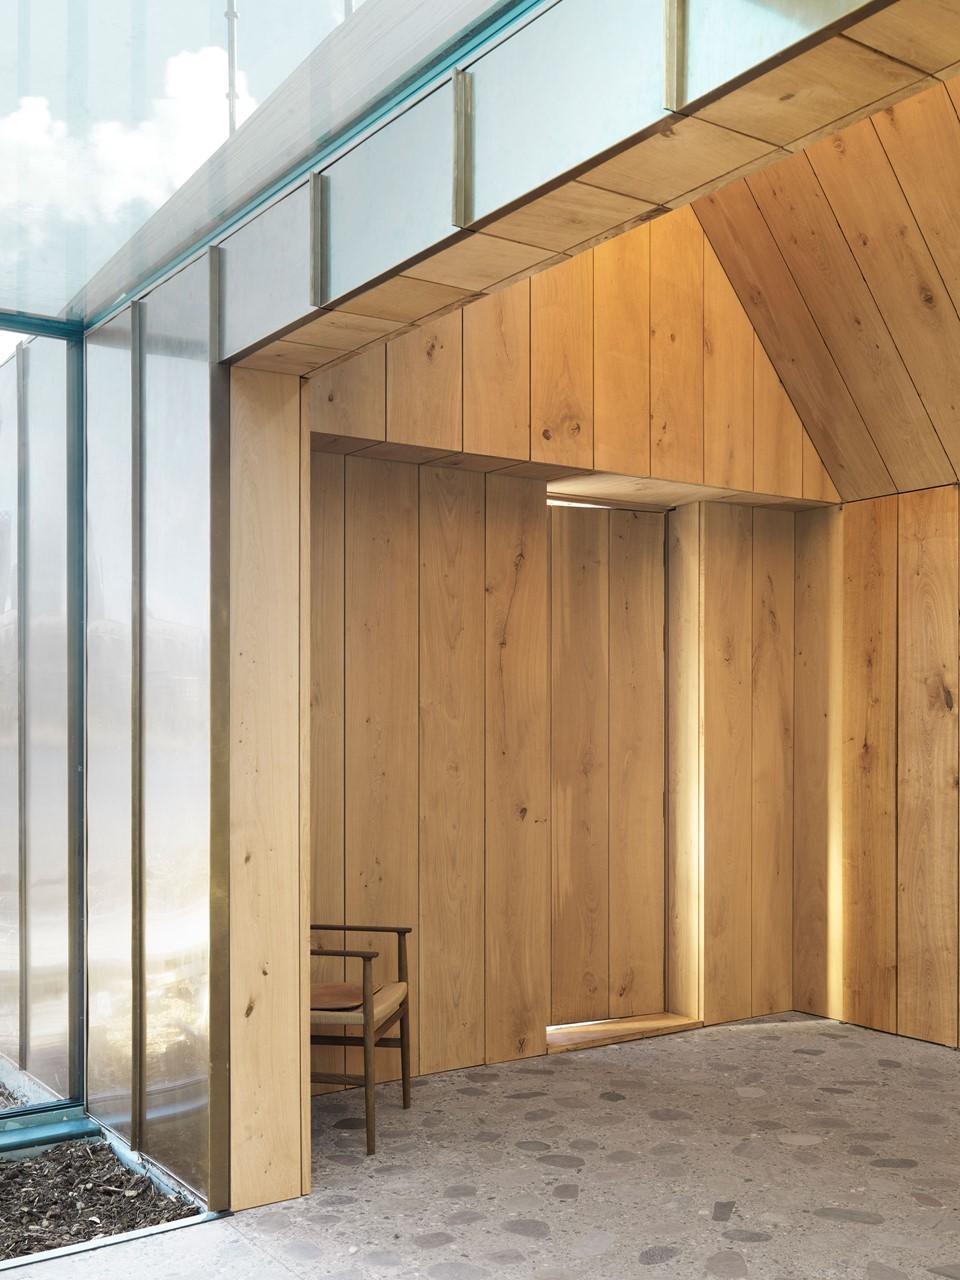 oak natural wall cladding ceiling noma entrance big builds dinesen.jpg